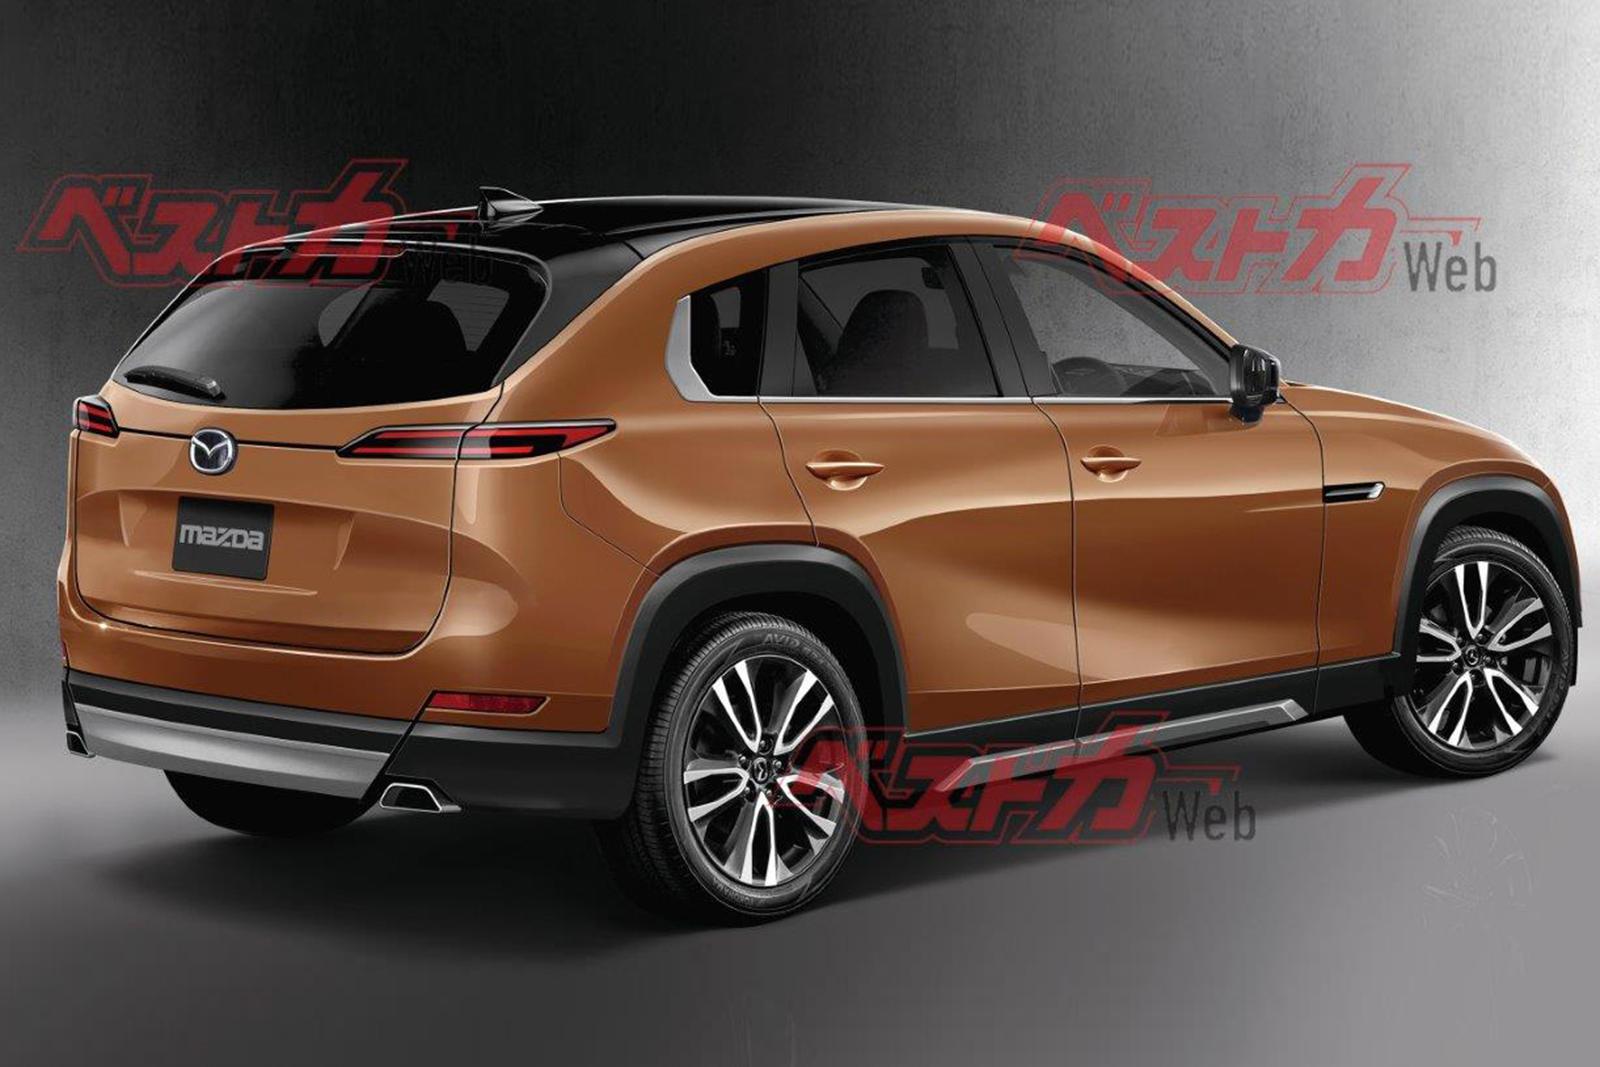 Mazda Cx 5 Will Be Reborn As Luxury Mercedes Glc Rival Carbuzz